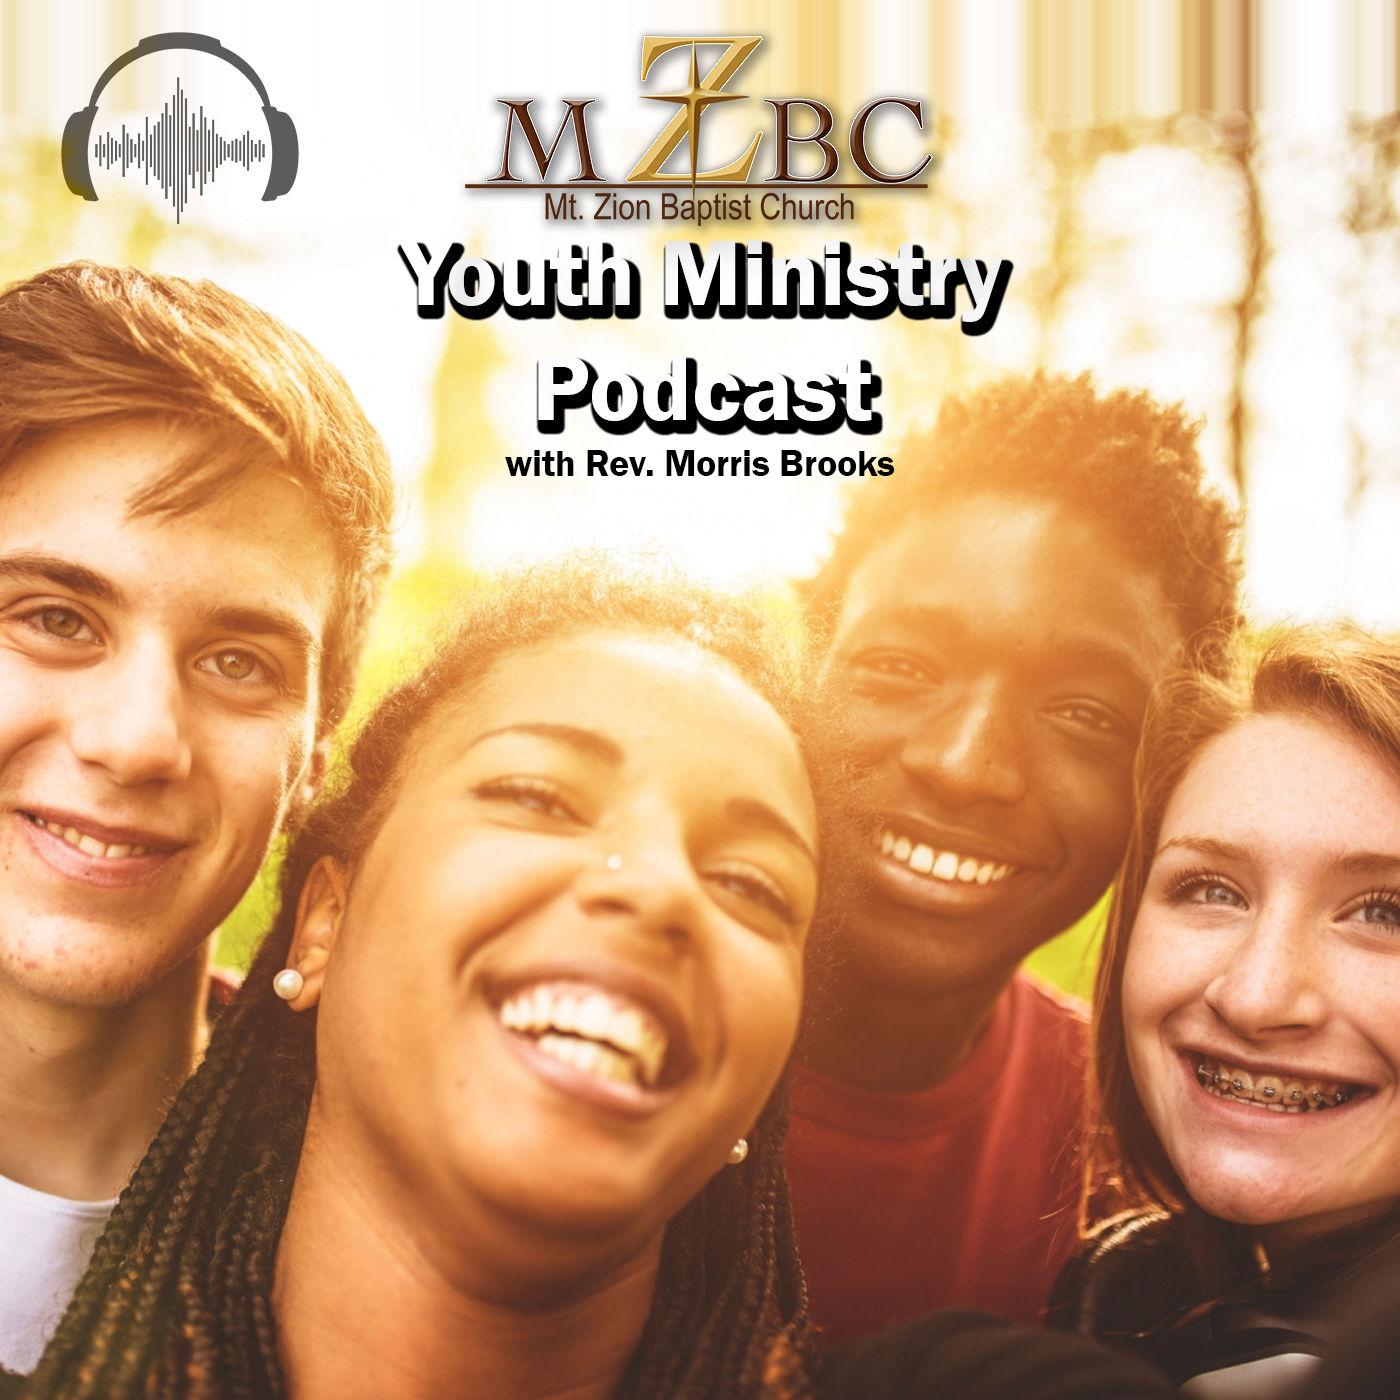 Mt. Zion Kalamazoo Youth Ministry Podcast